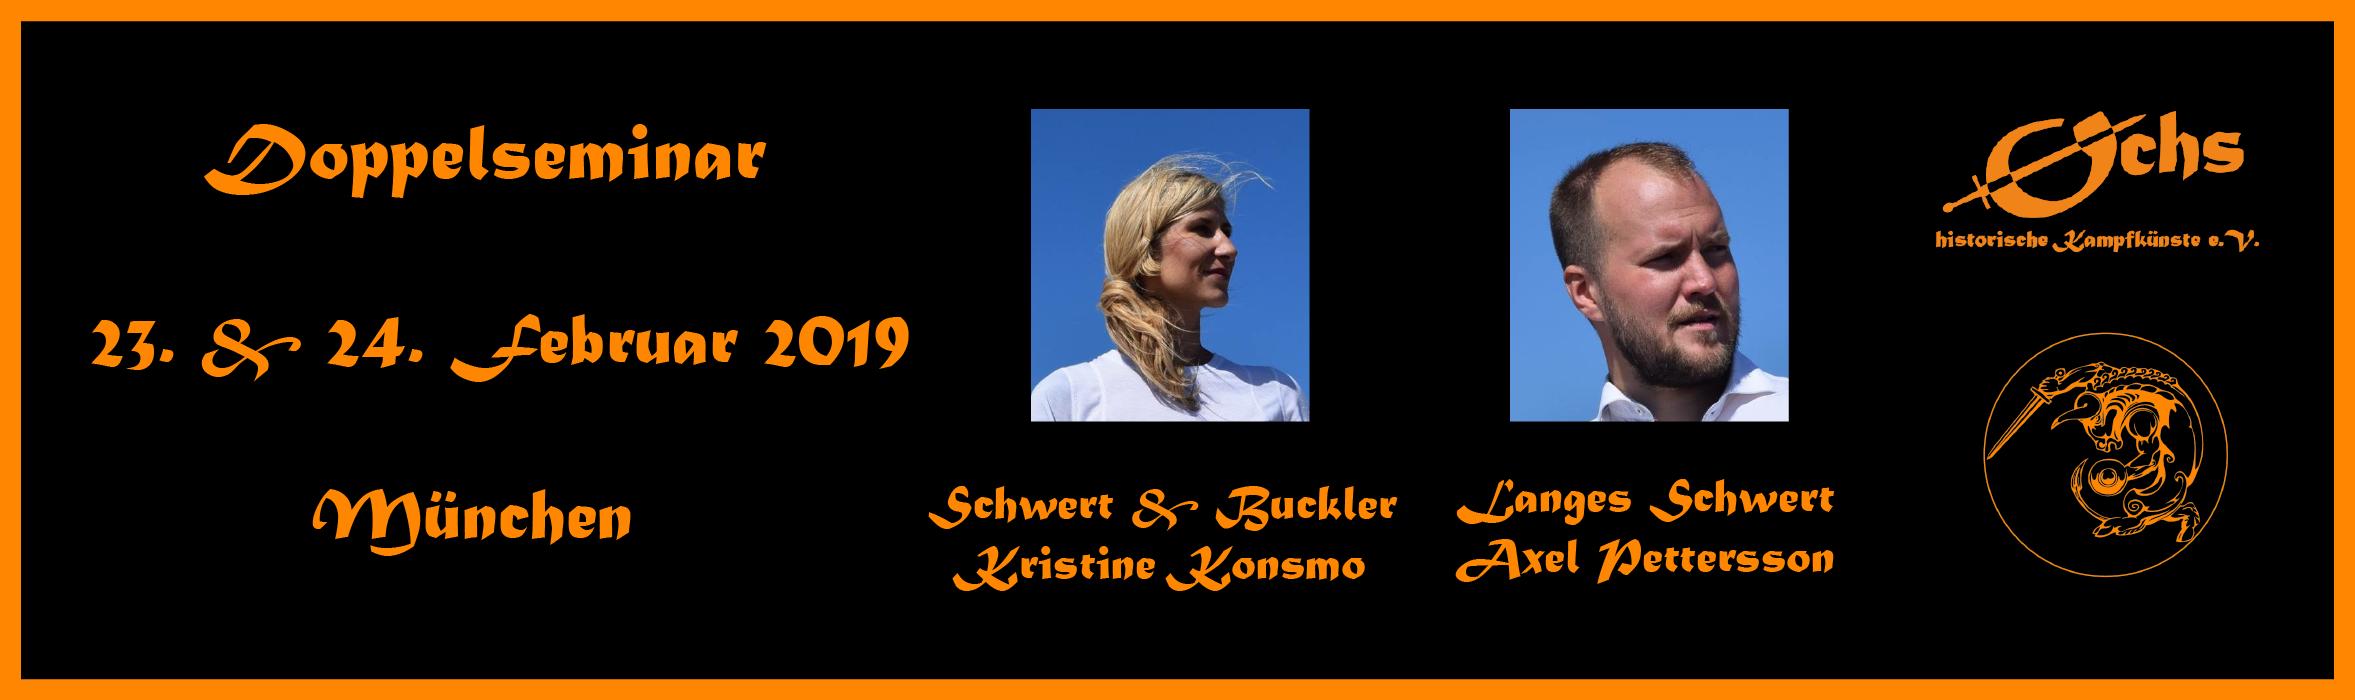 Doppelseminar Kristine Konsmo und Axel Pettersson